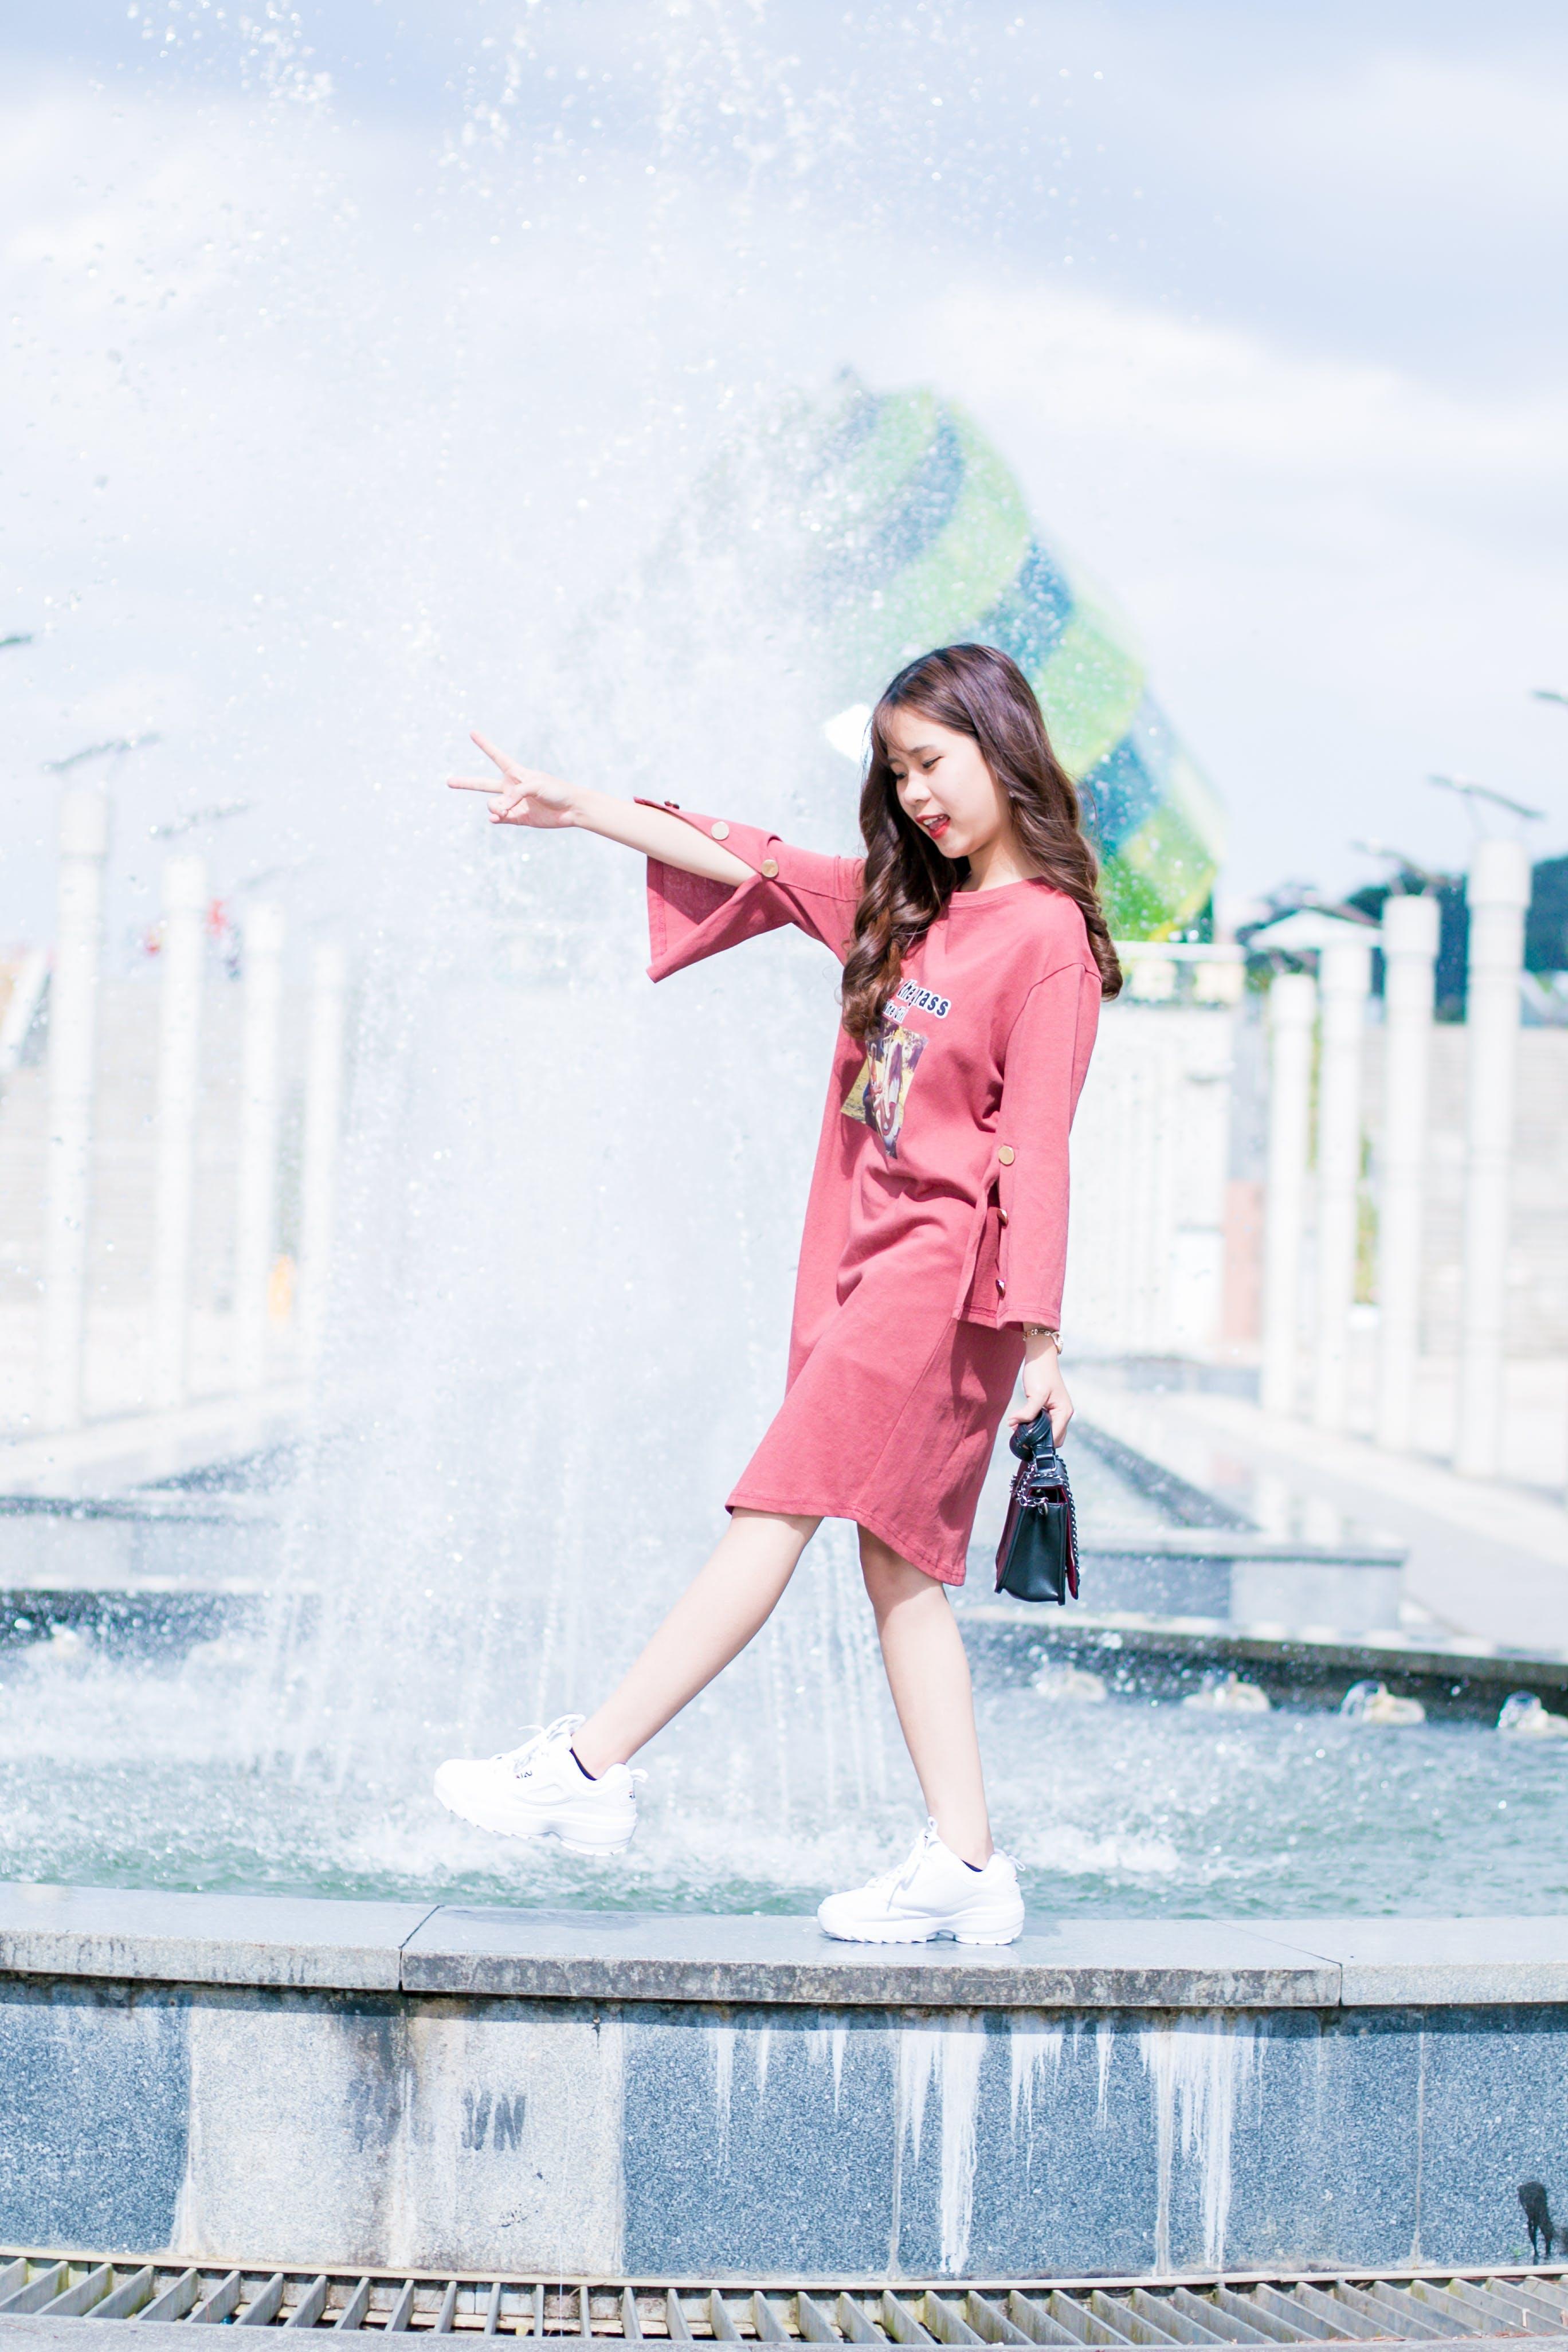 Woman Wearing Pink Long-sleeved Dress Walking on Fountain during Daytinme